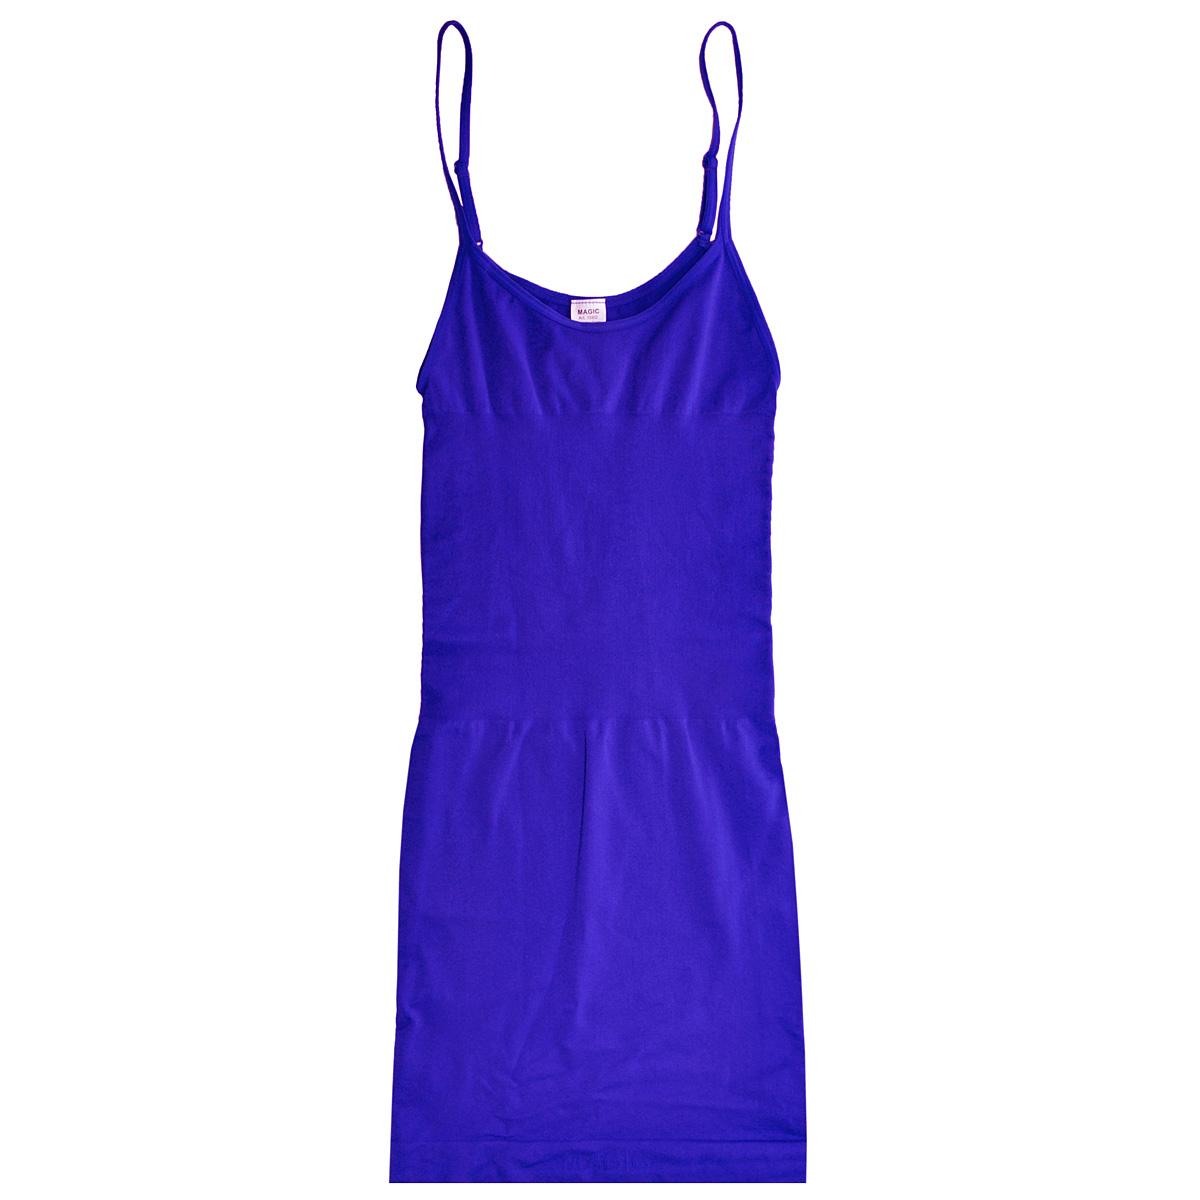 Платье Magic BodyFashion Seamless Dress, корректирующее, цвет: синий. 15BD. Размер M (46)